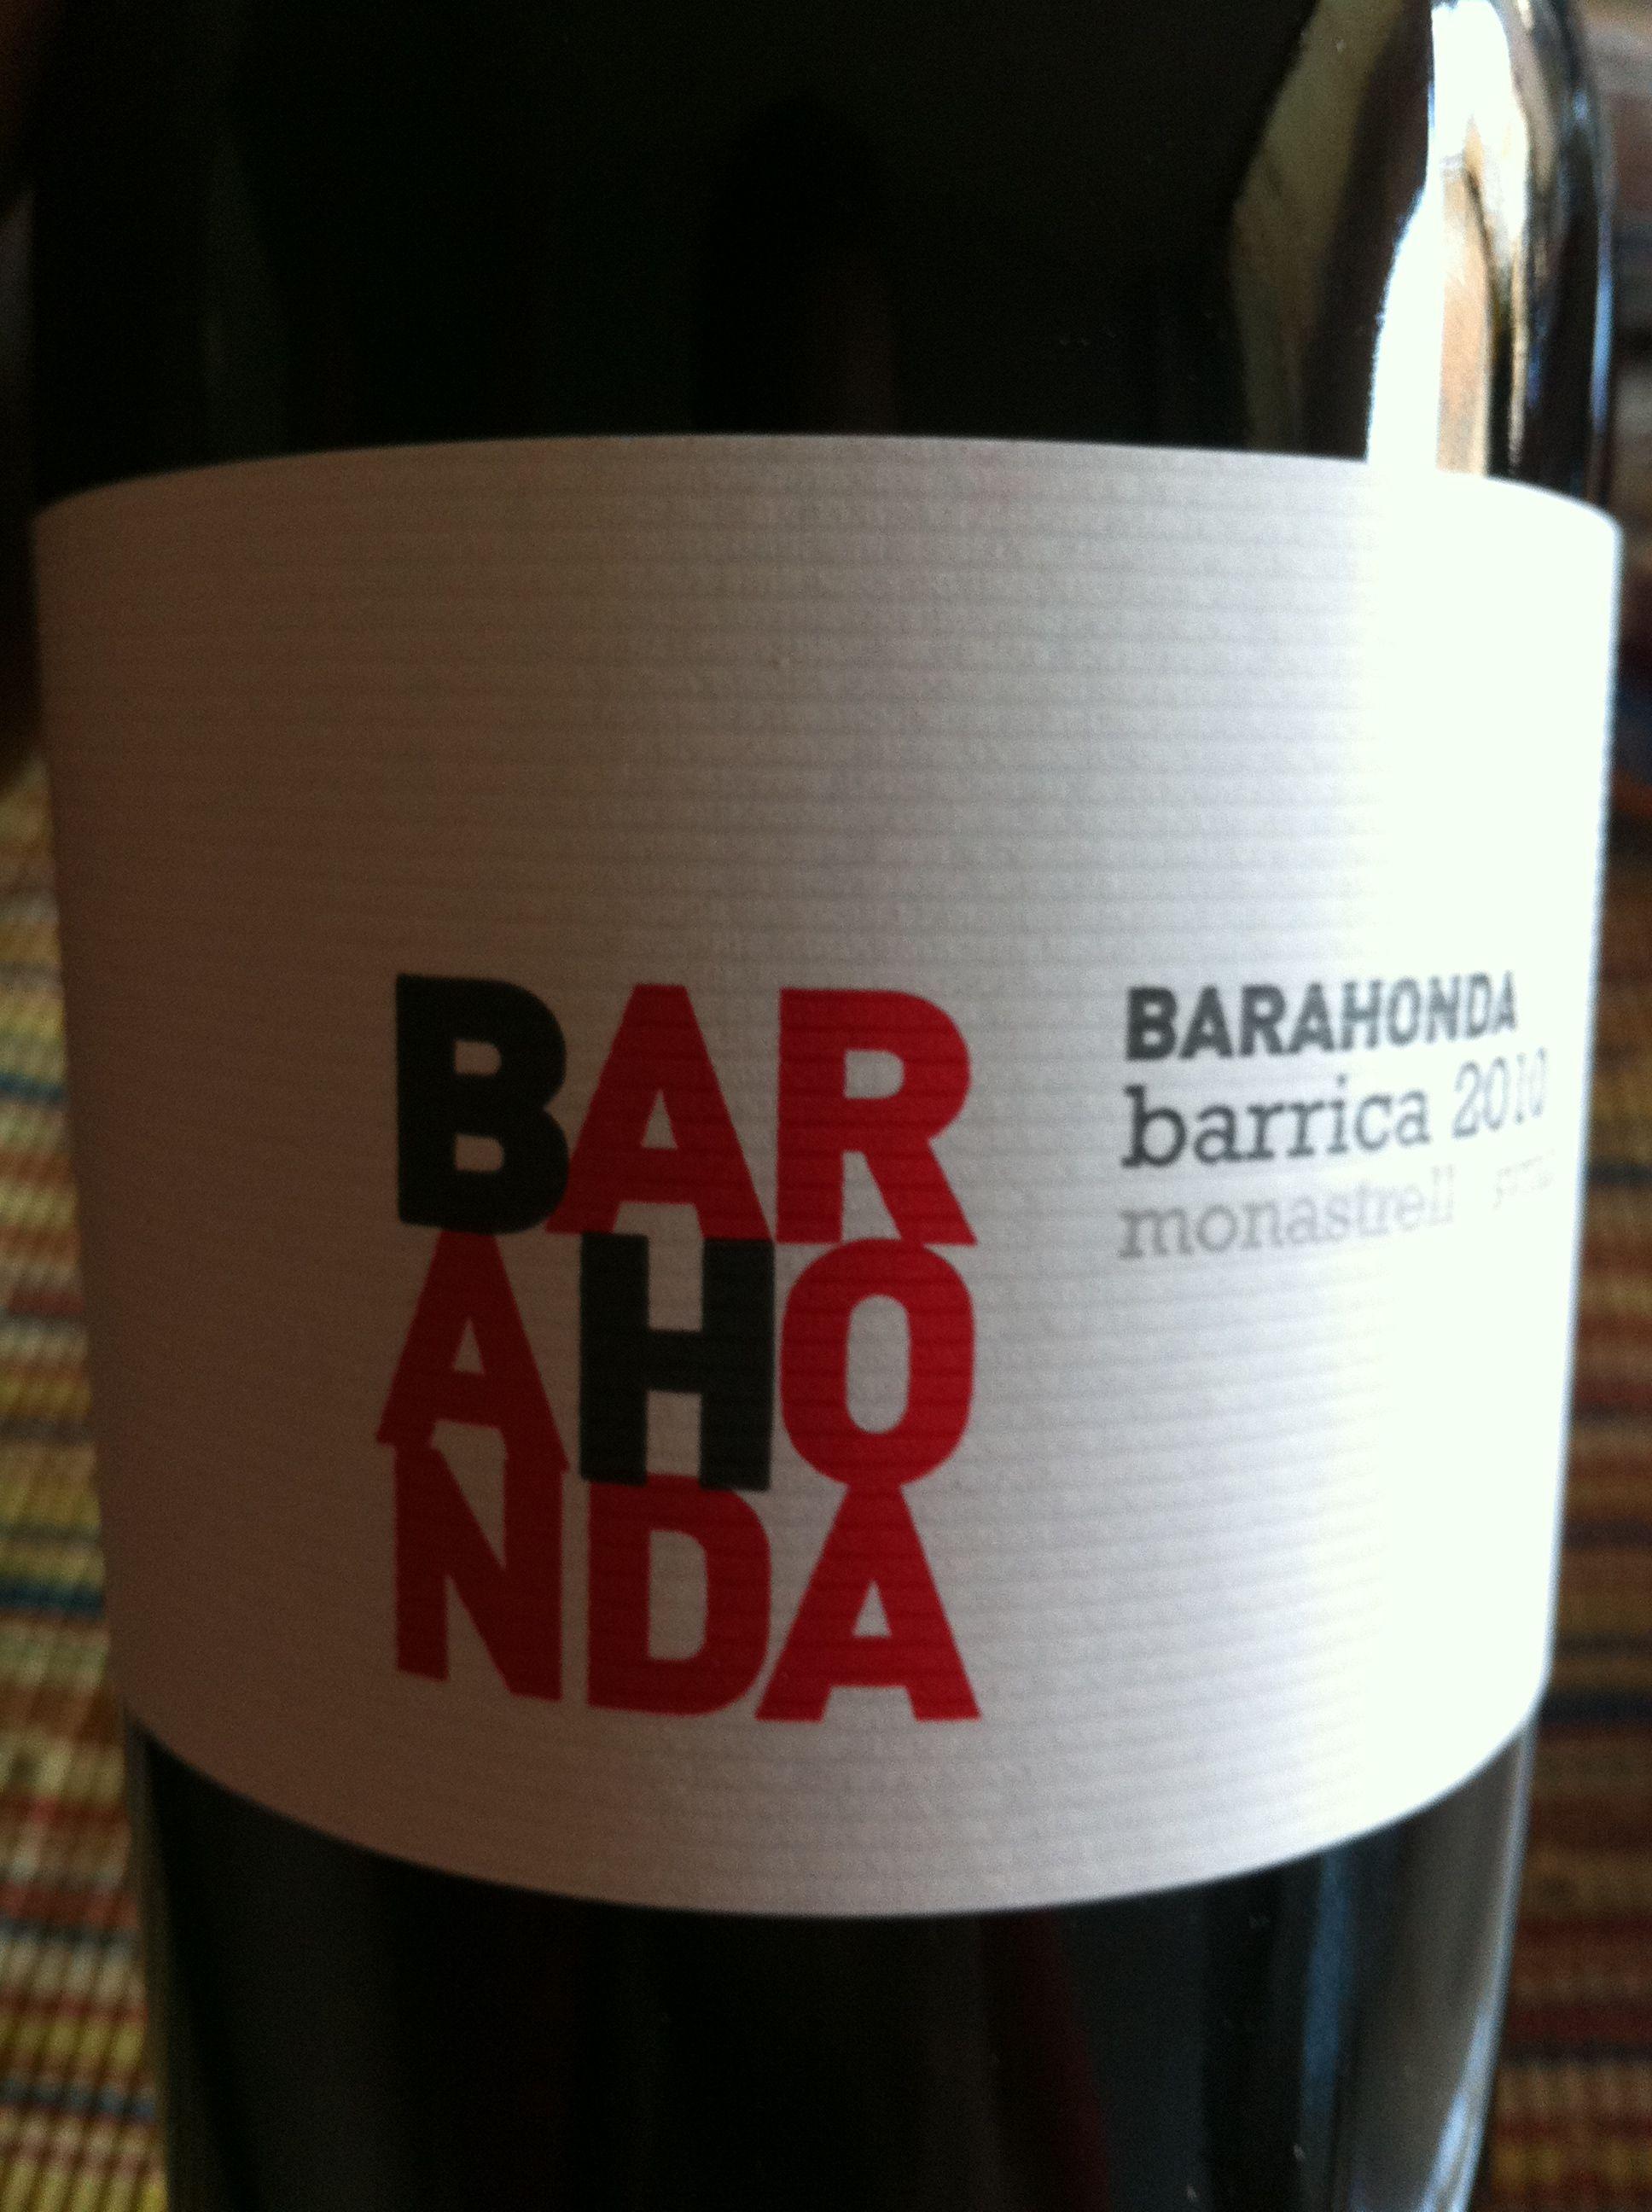 Barahonda Barrica 2010